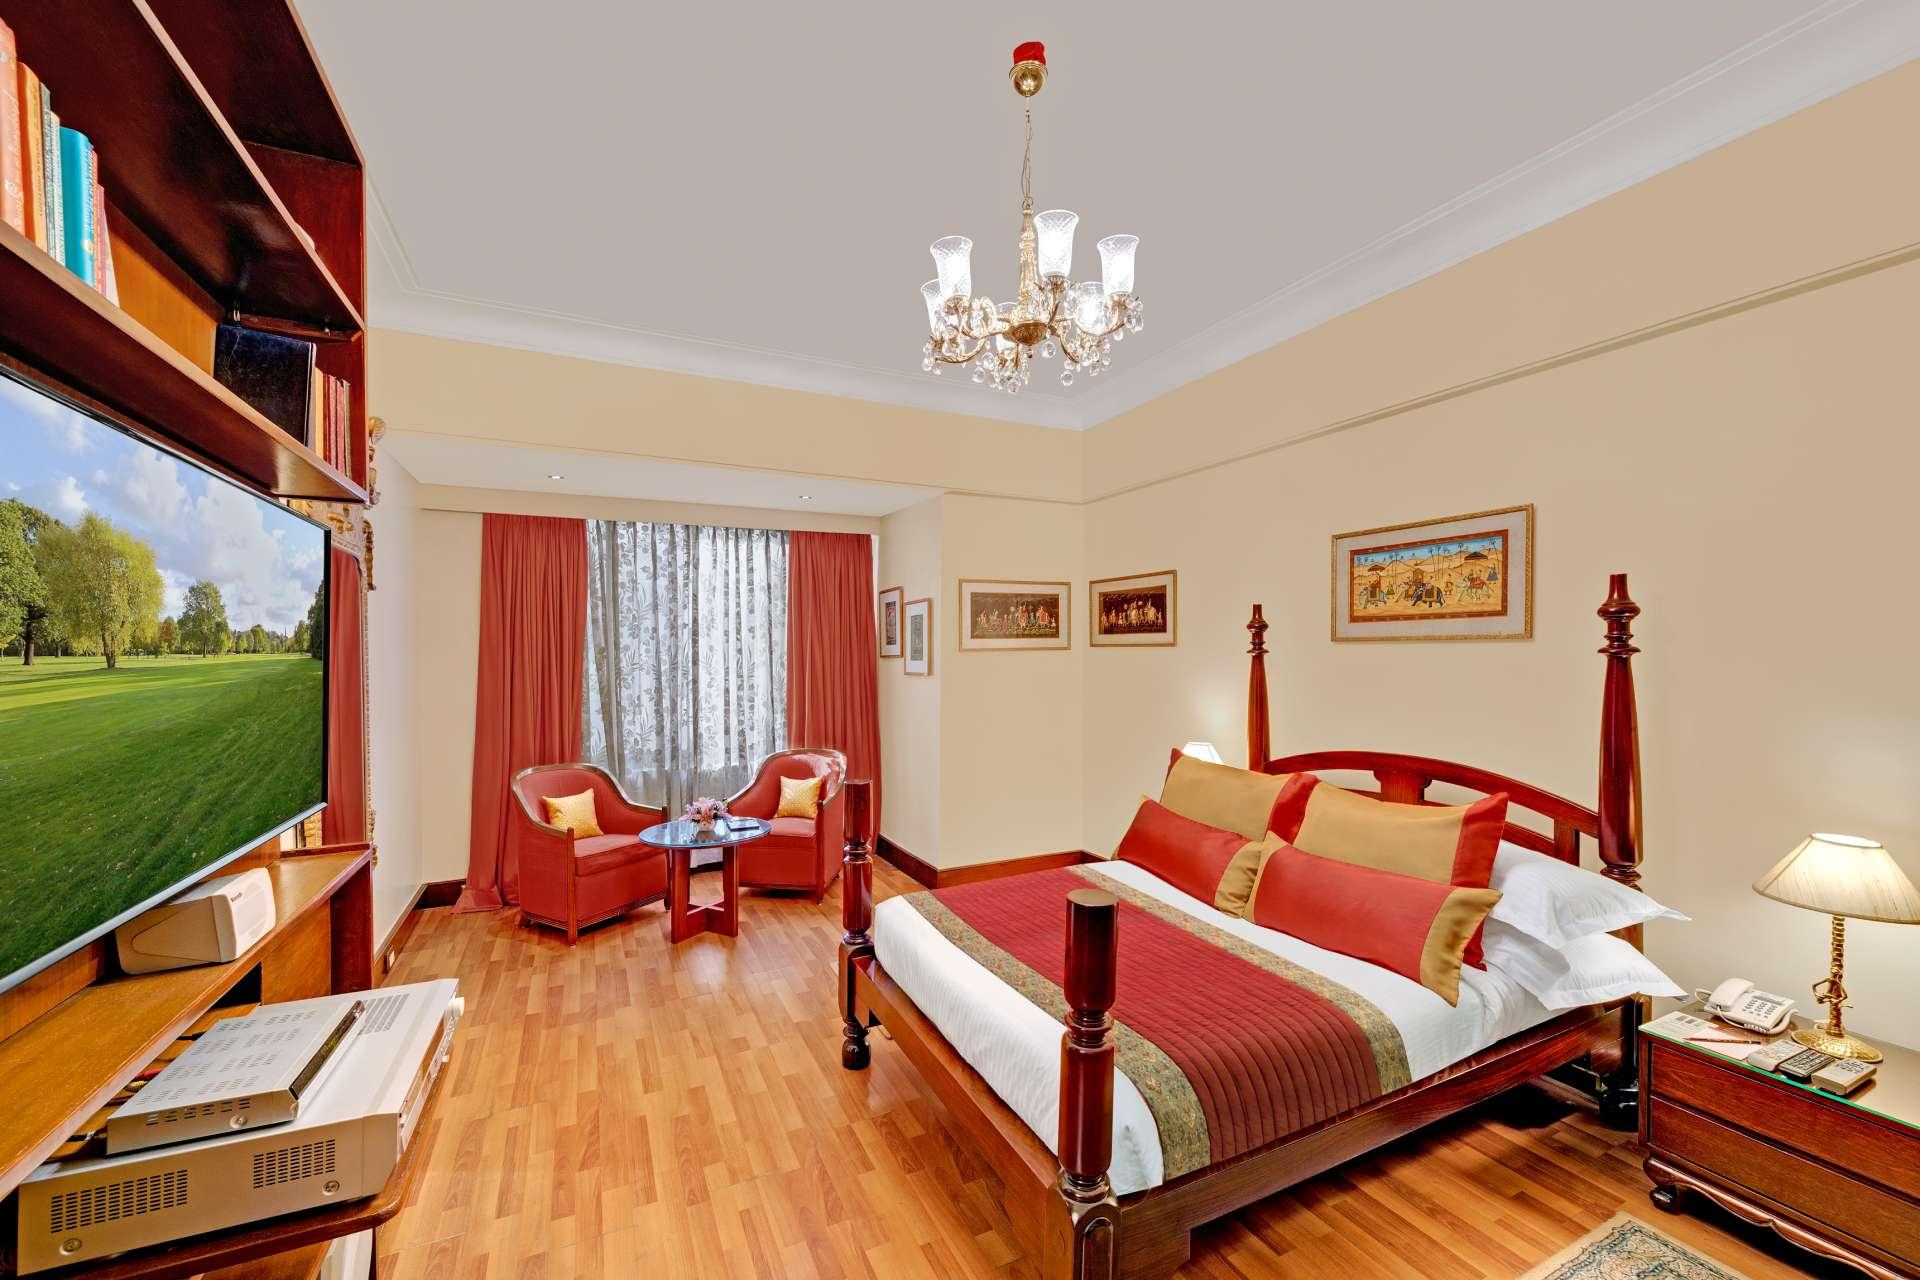 the ambassdador Presidential Suite Room - The Ambassador | Heritage Hotels in Mumbai, Aurangabad, Chennai - Presidential Suite